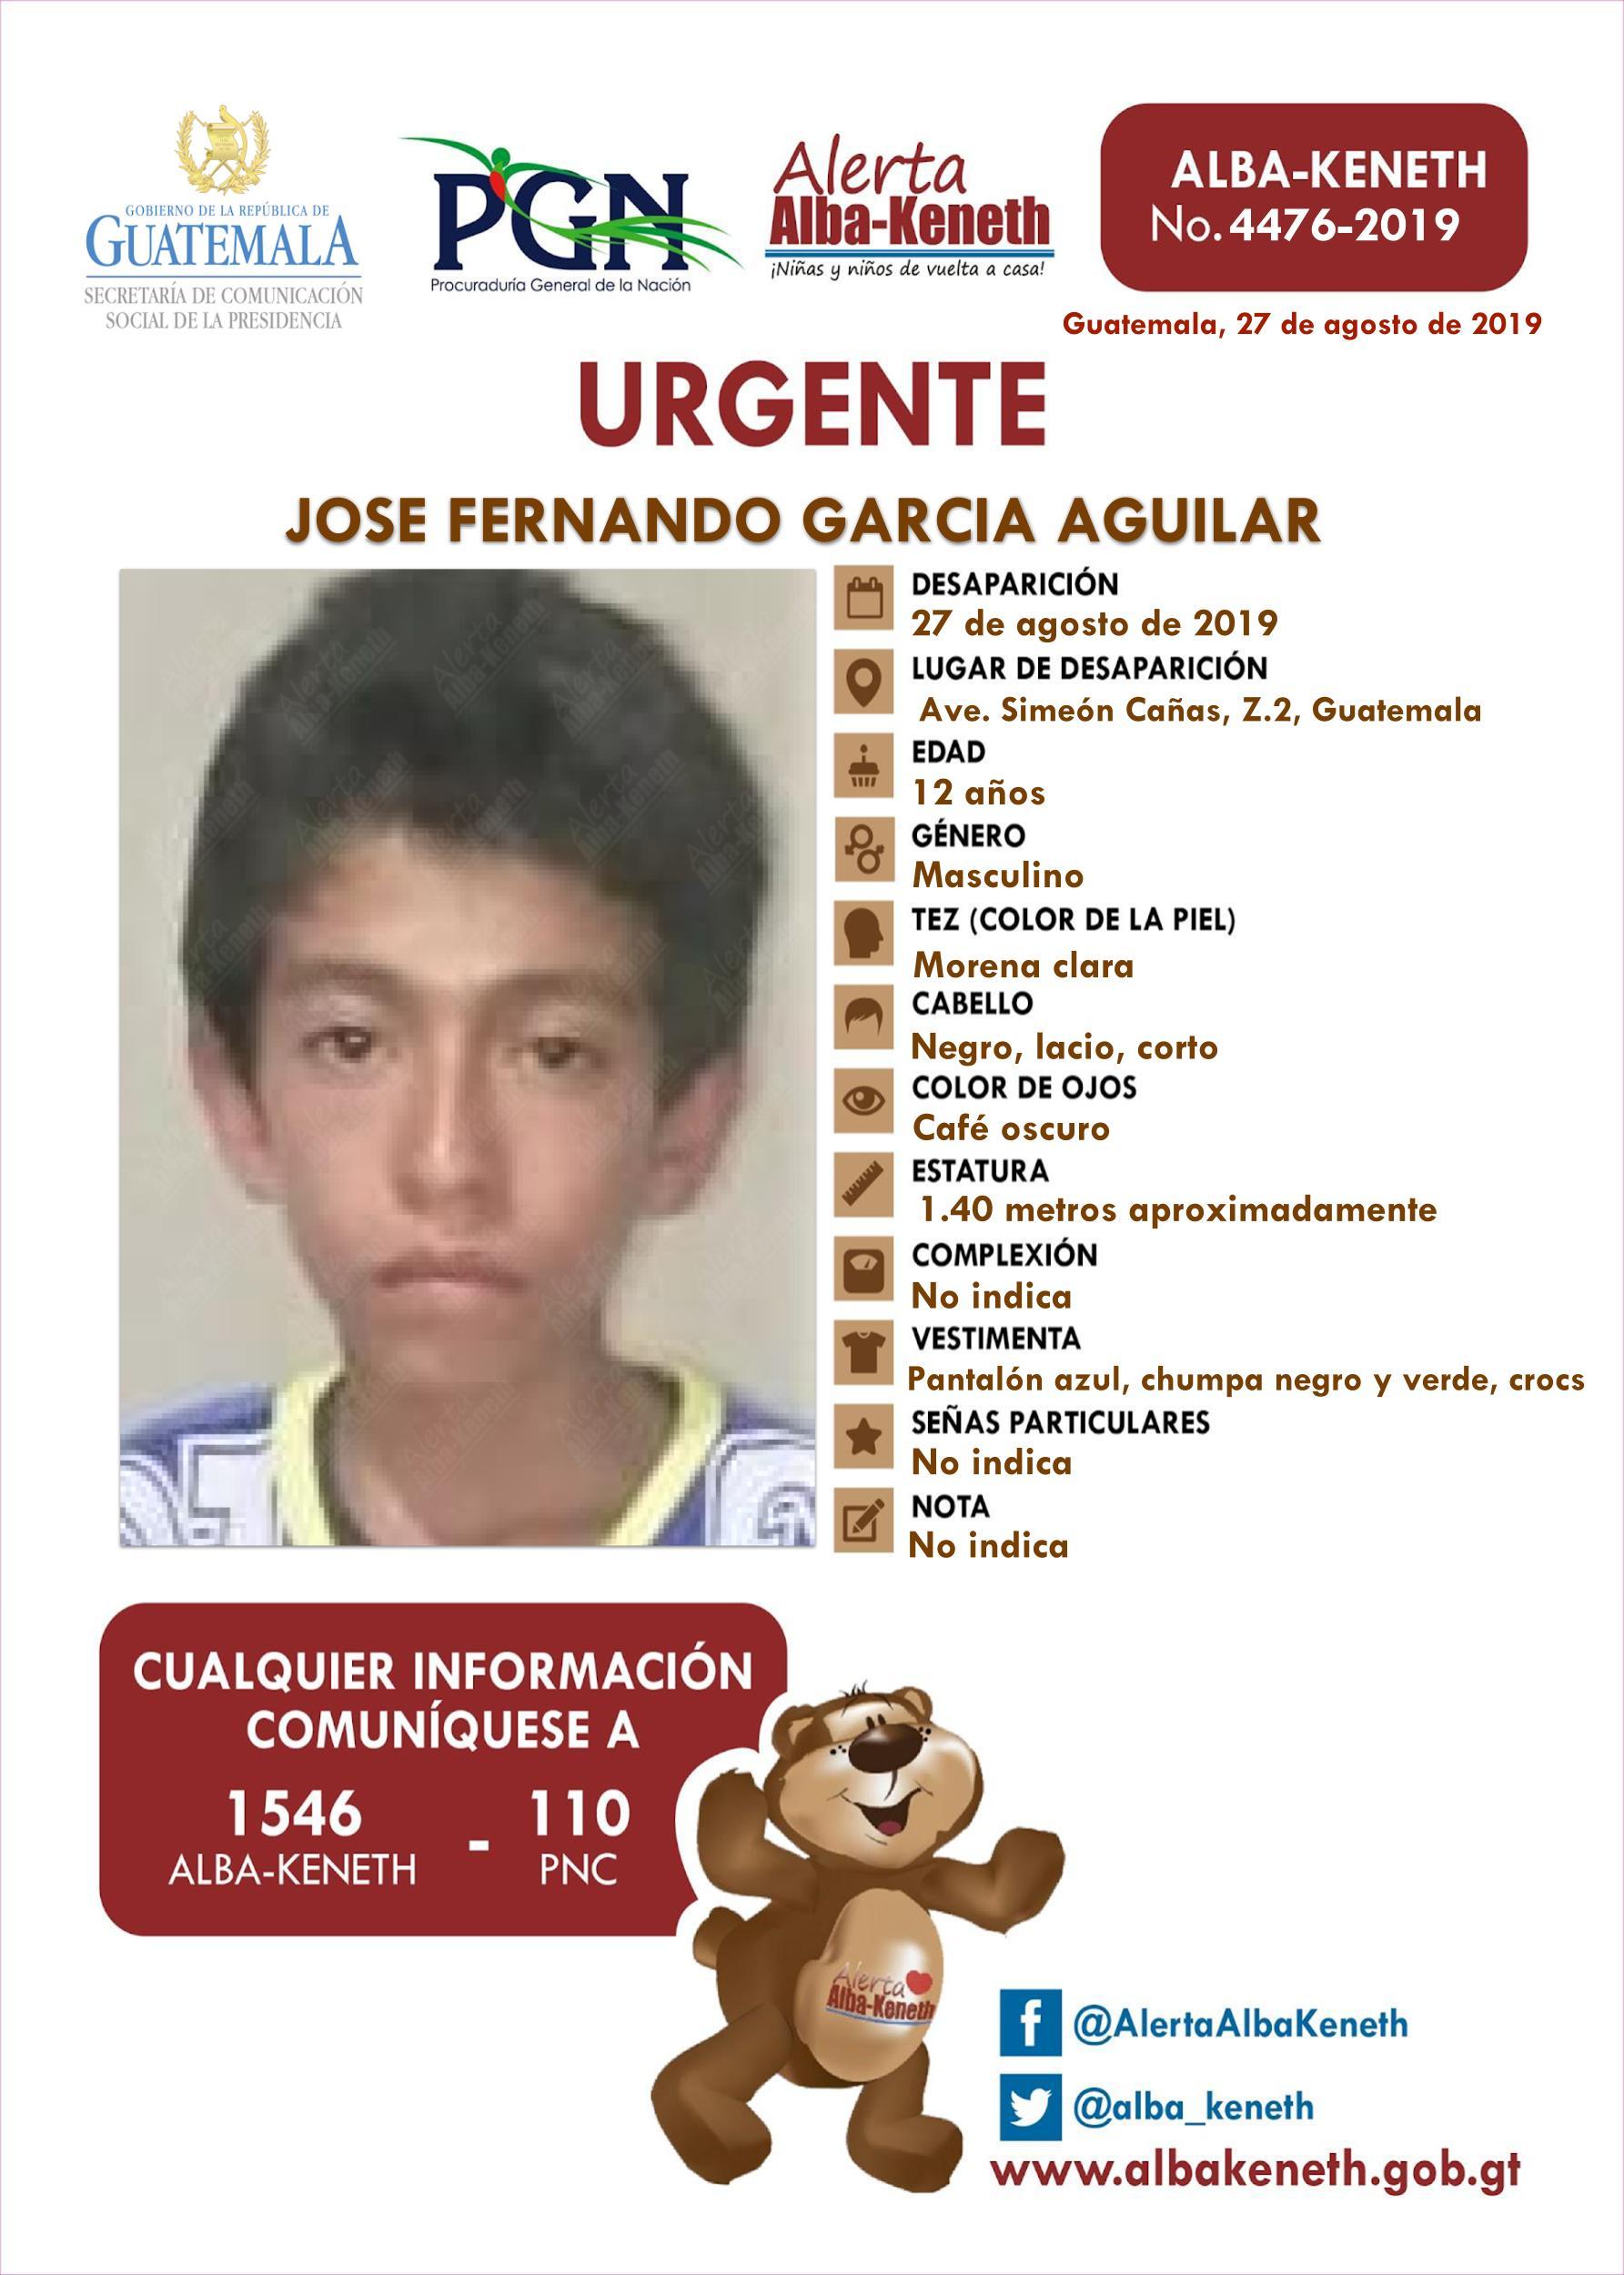 Jose Fernando Garcia Aguilar